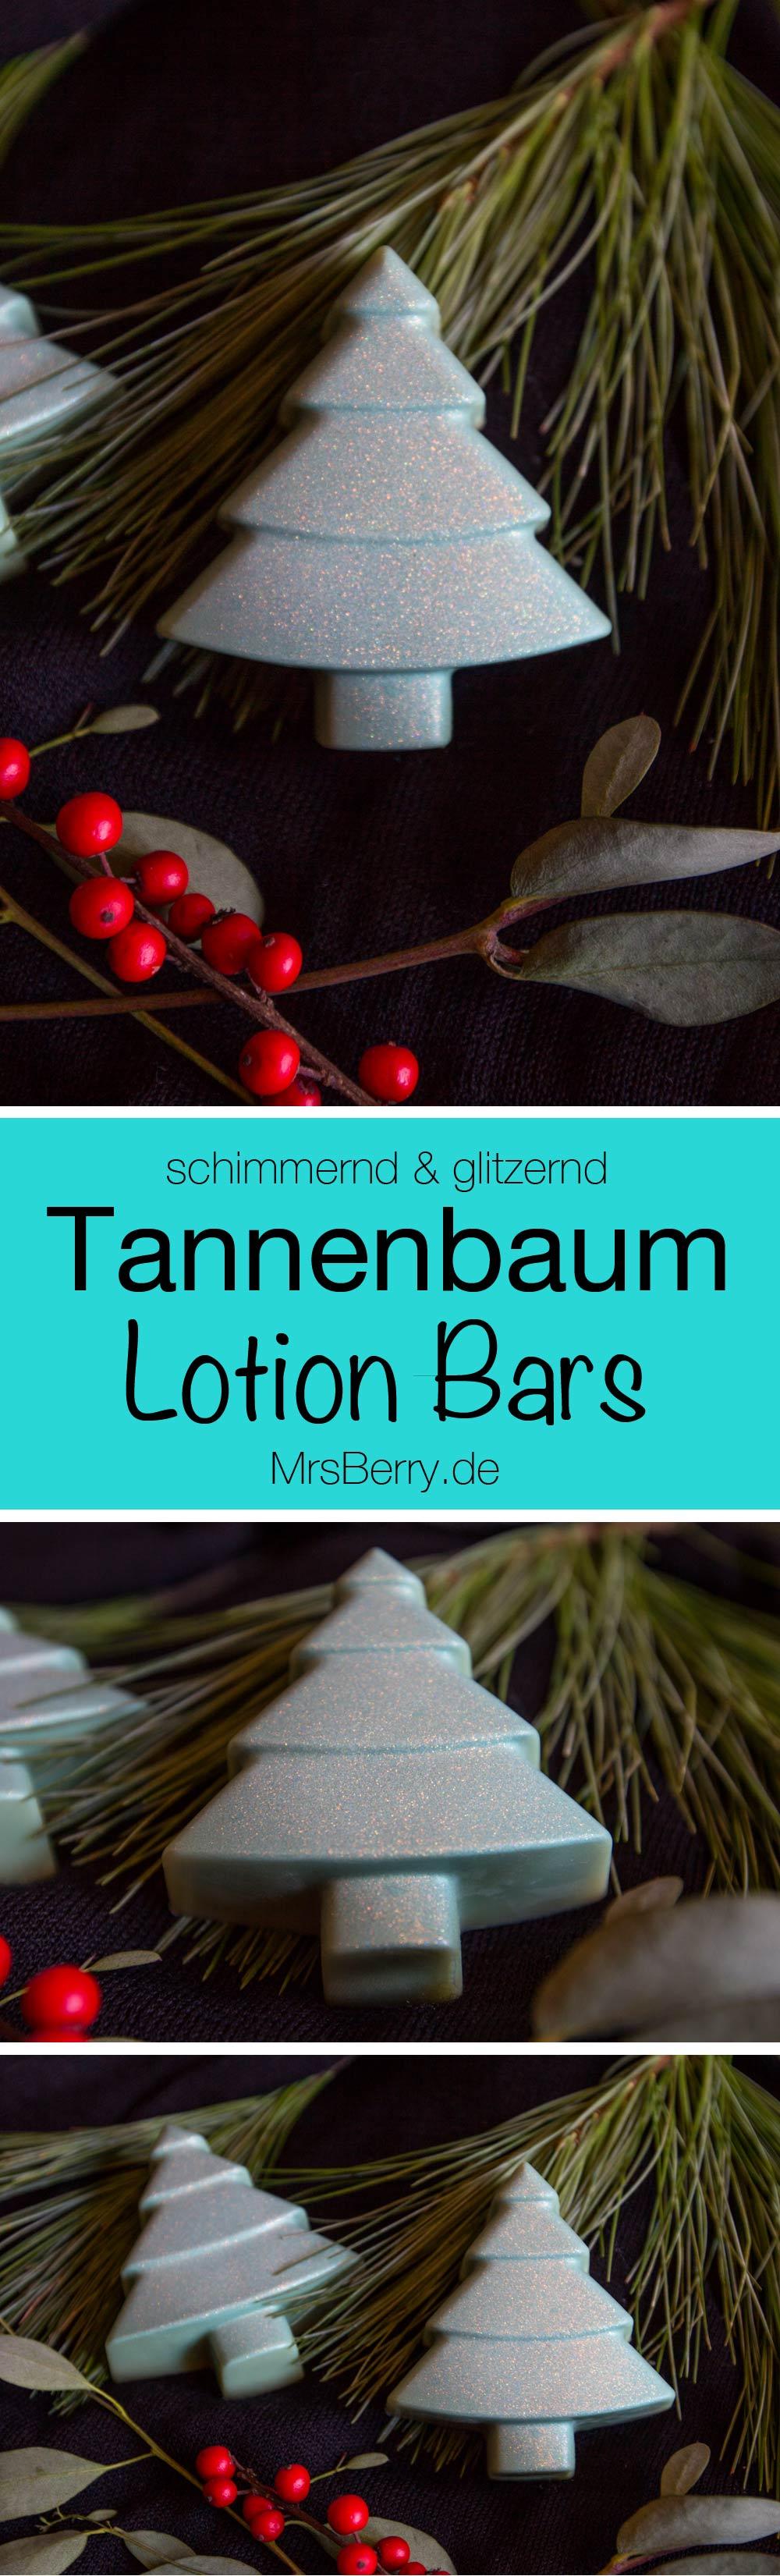 beauty diy tannenbaum lotion bars selber machen. Black Bedroom Furniture Sets. Home Design Ideas